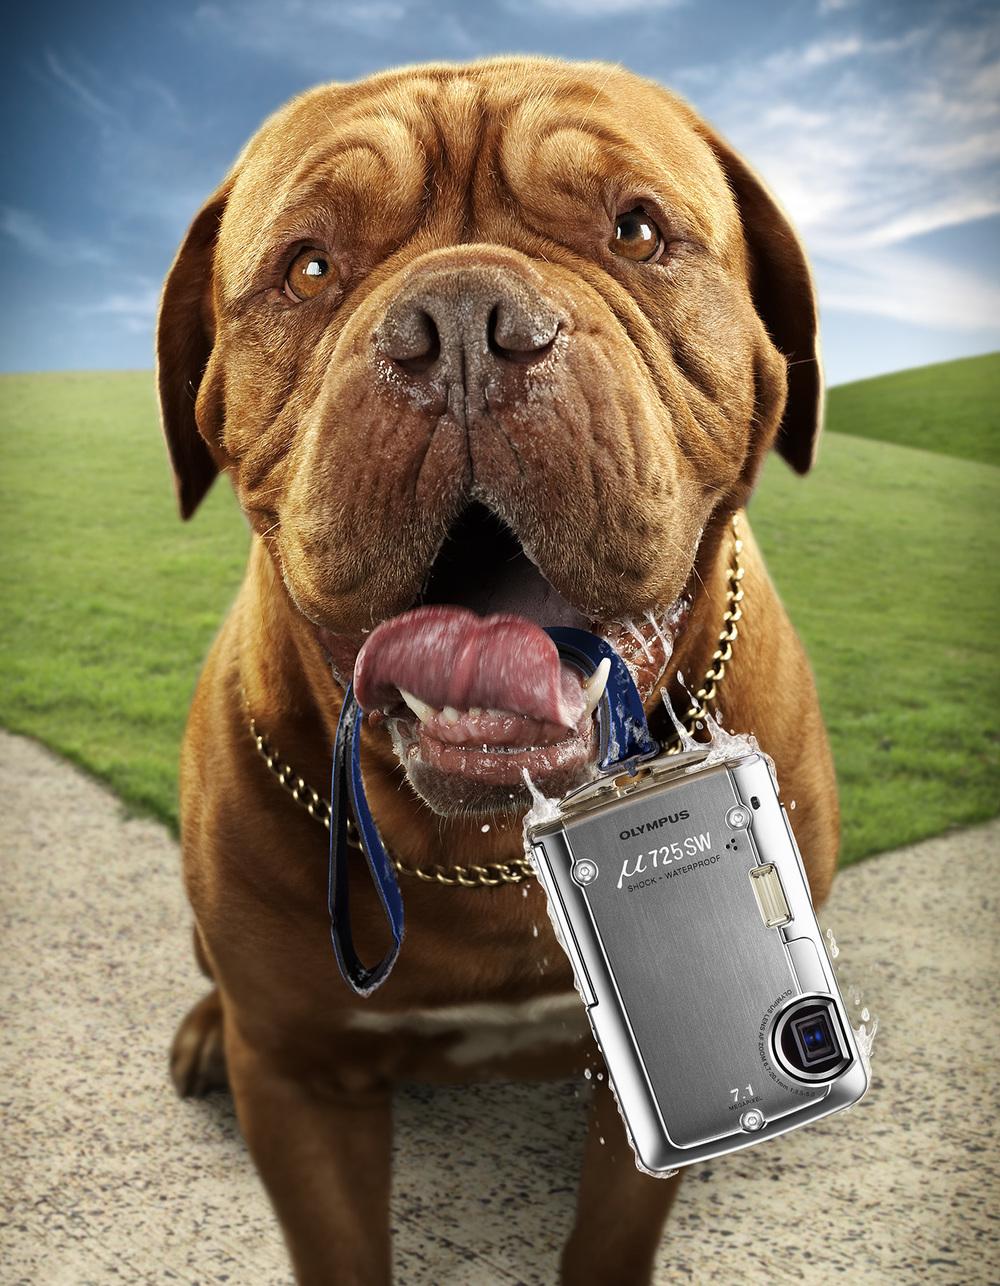 Olympus Tough cameras